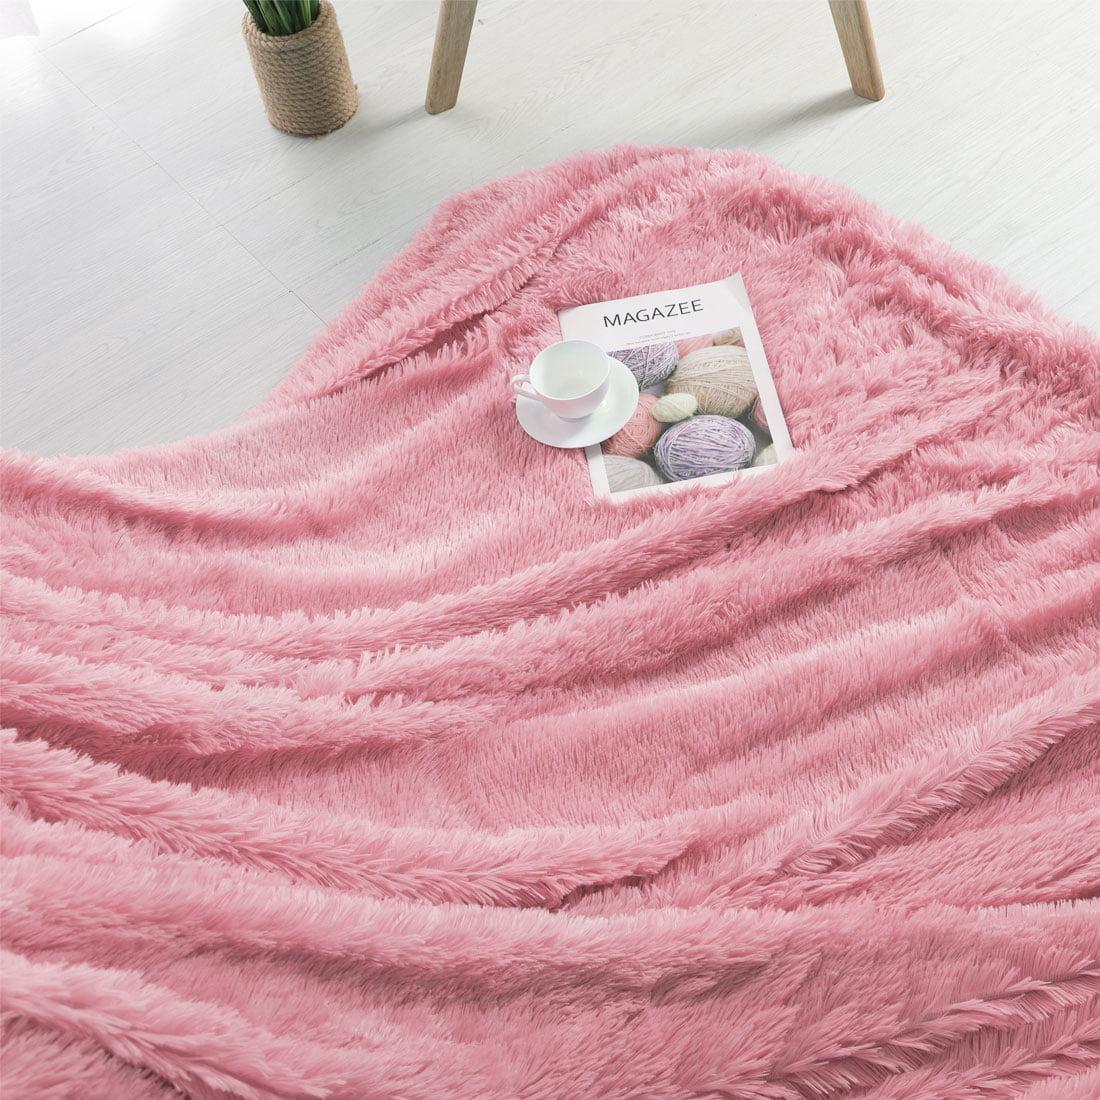 "Luxury Soft Shaggy Faux Fur Blanket Ultra Blanket Twin 59"" x 78"" Light Yellow"